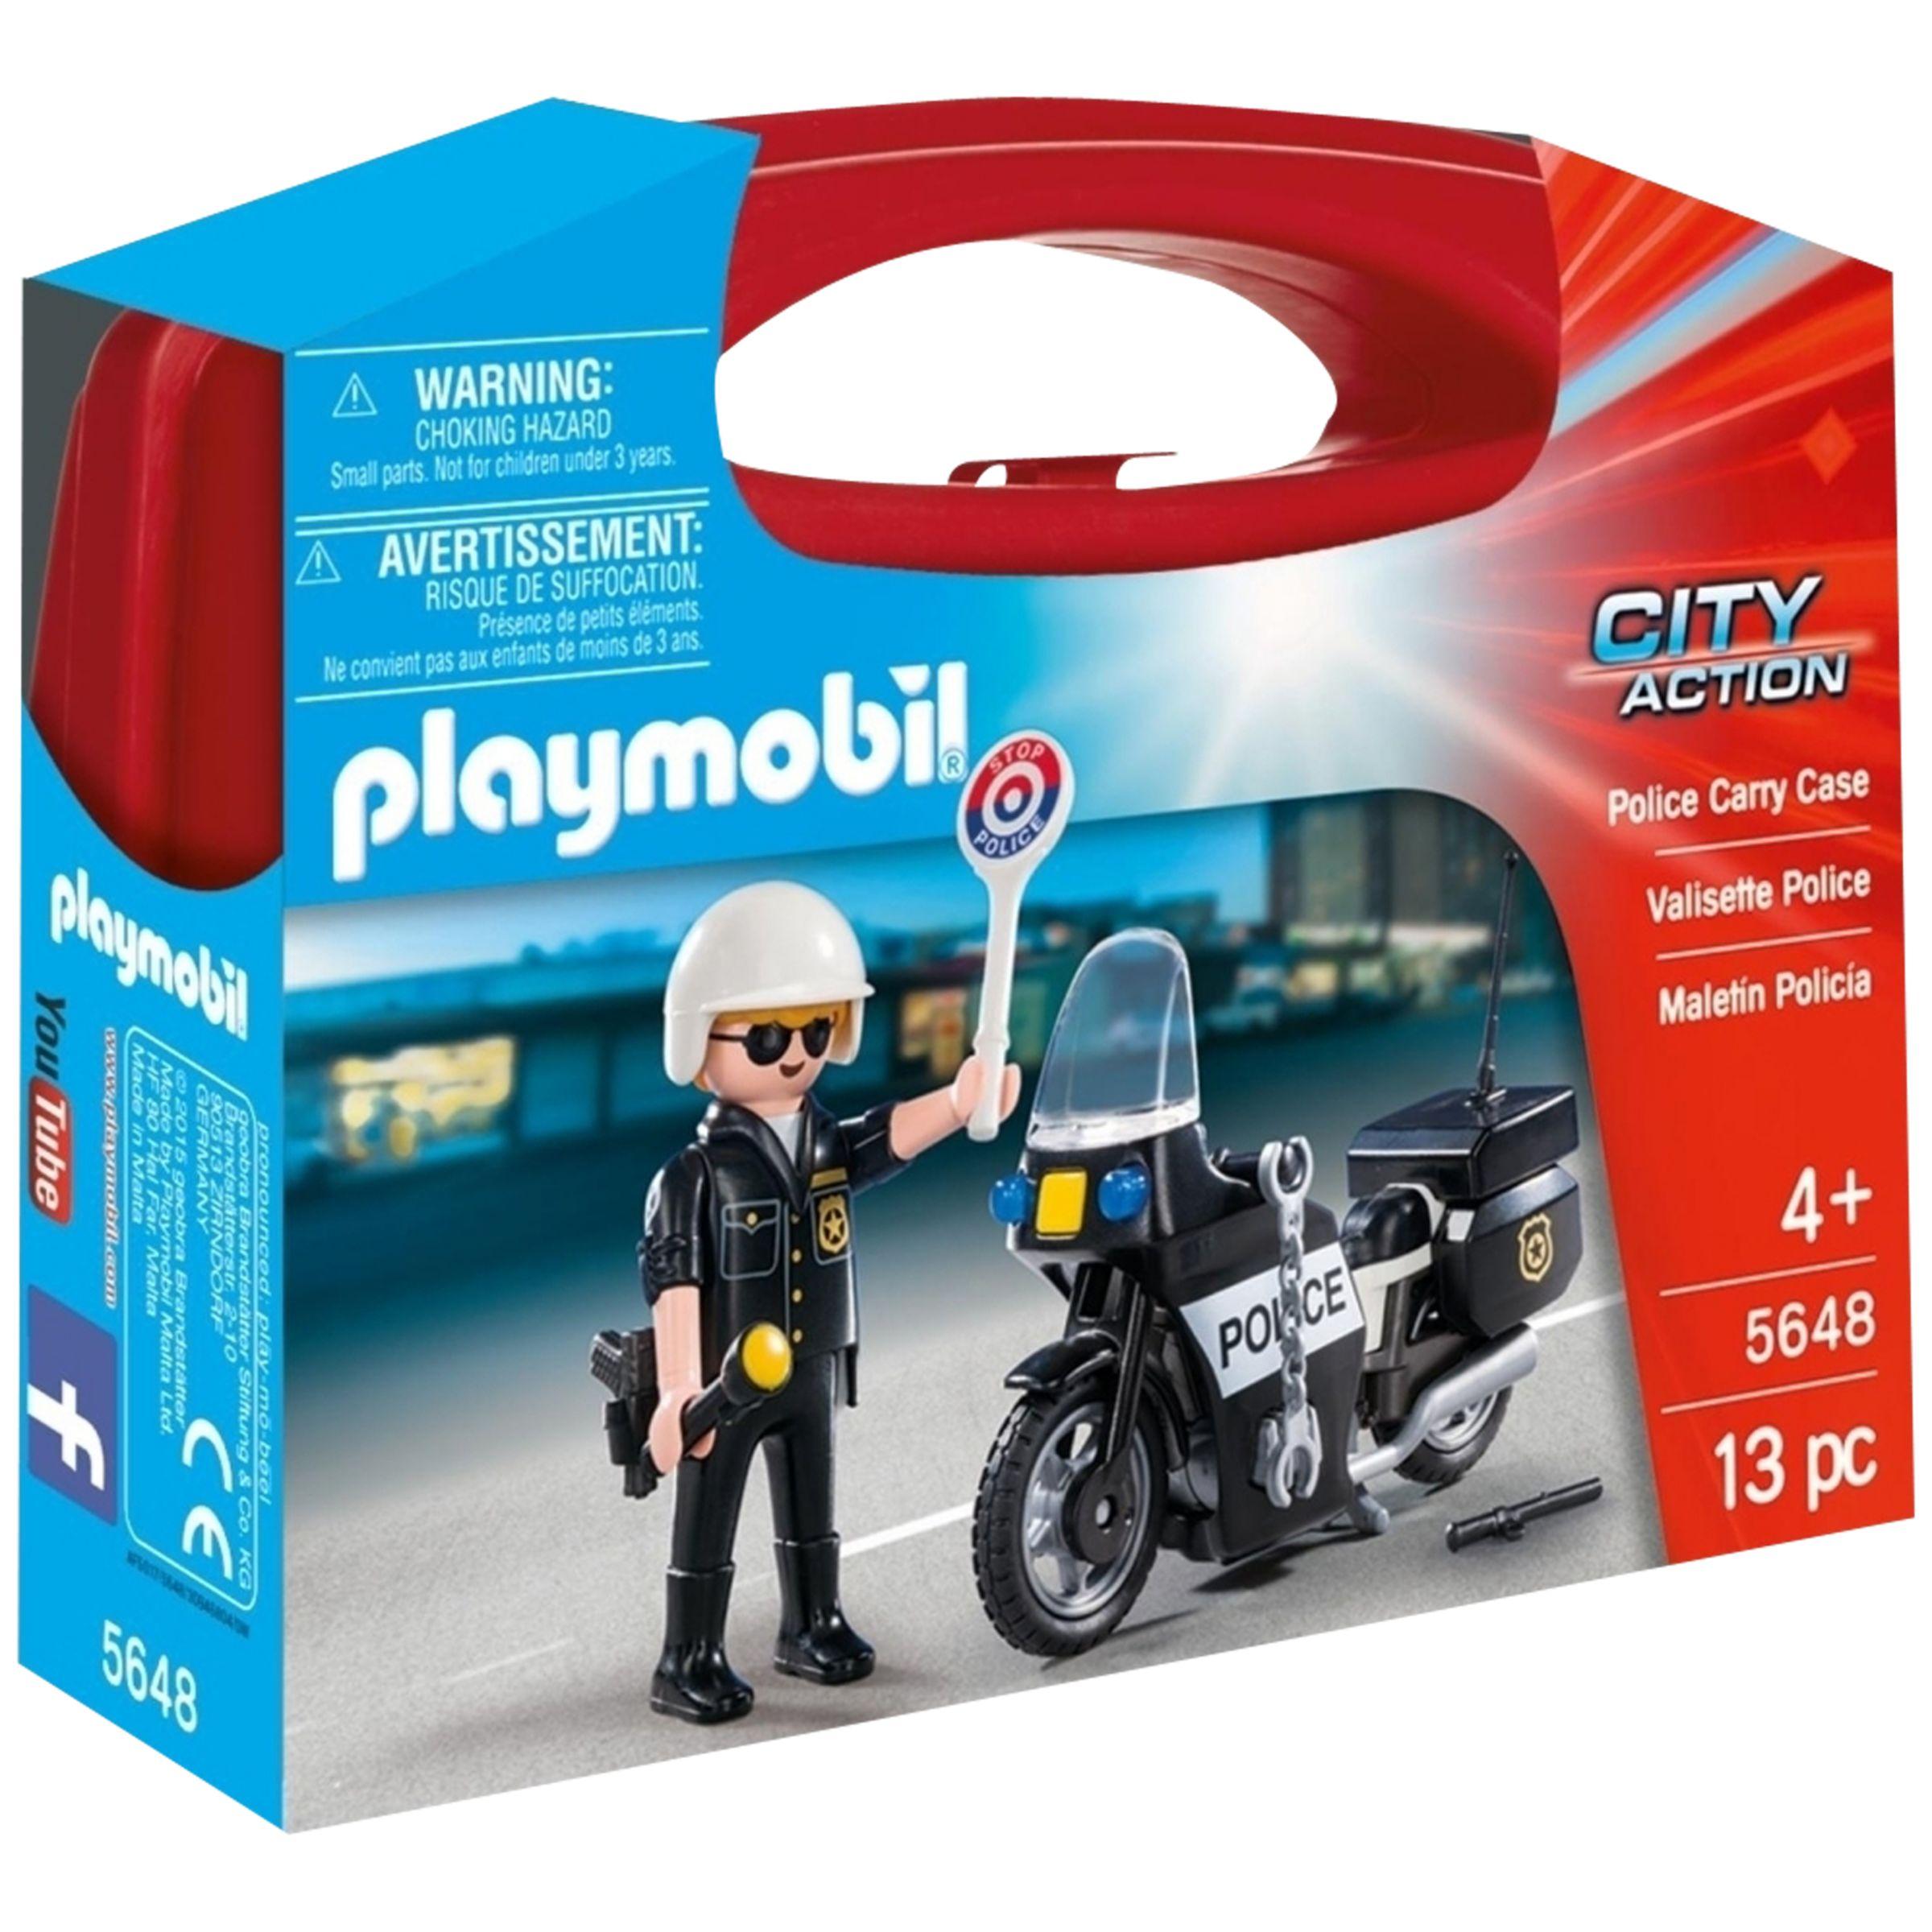 PLAYMOBIL Playmobil Police Carry Case